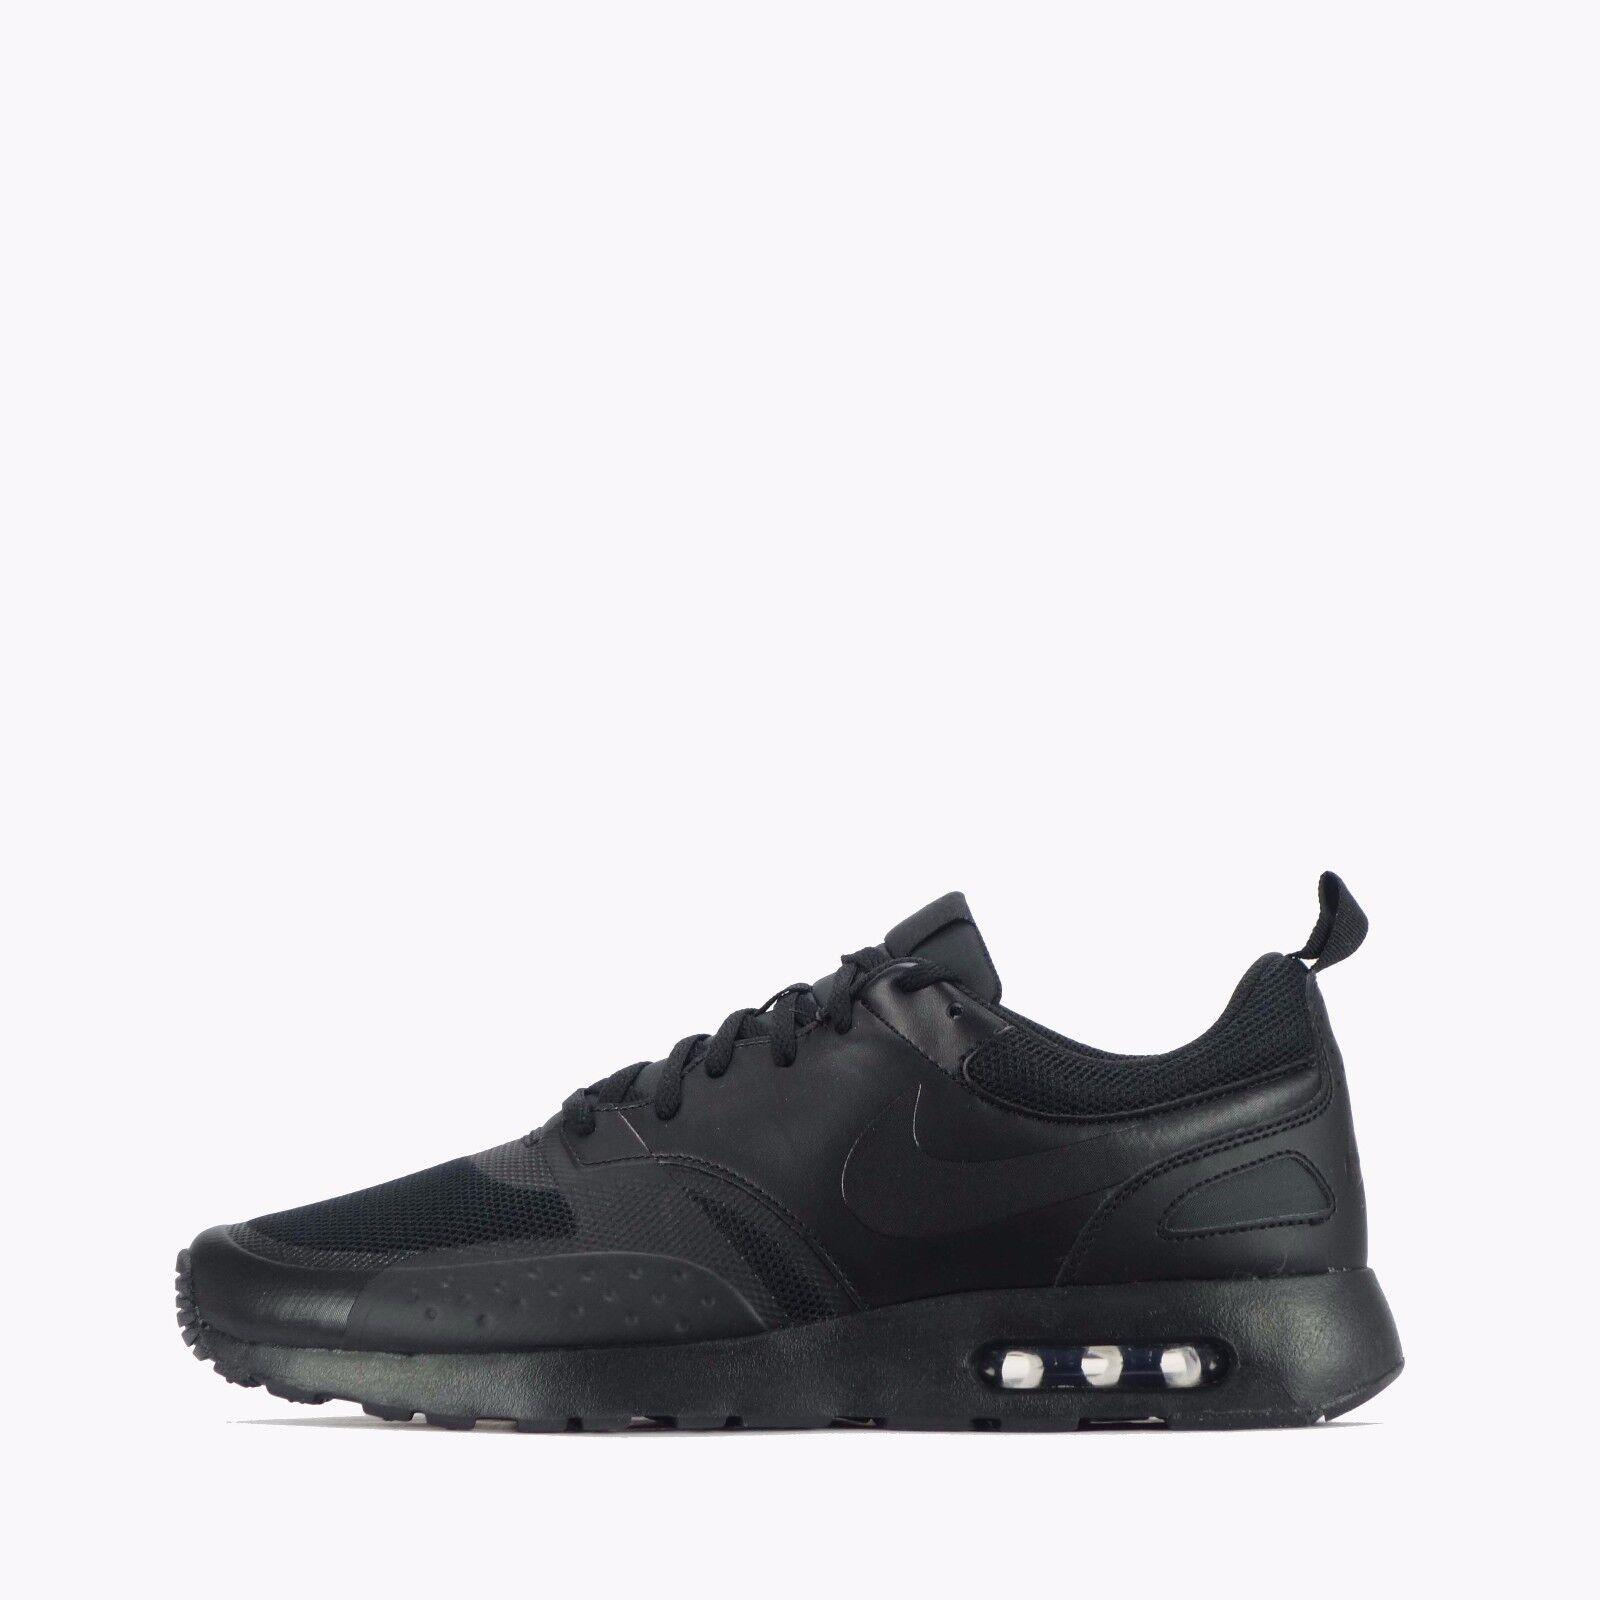 Nike air max vision männer schuhe schwarz / schwarz schwarz schwarz b7561c